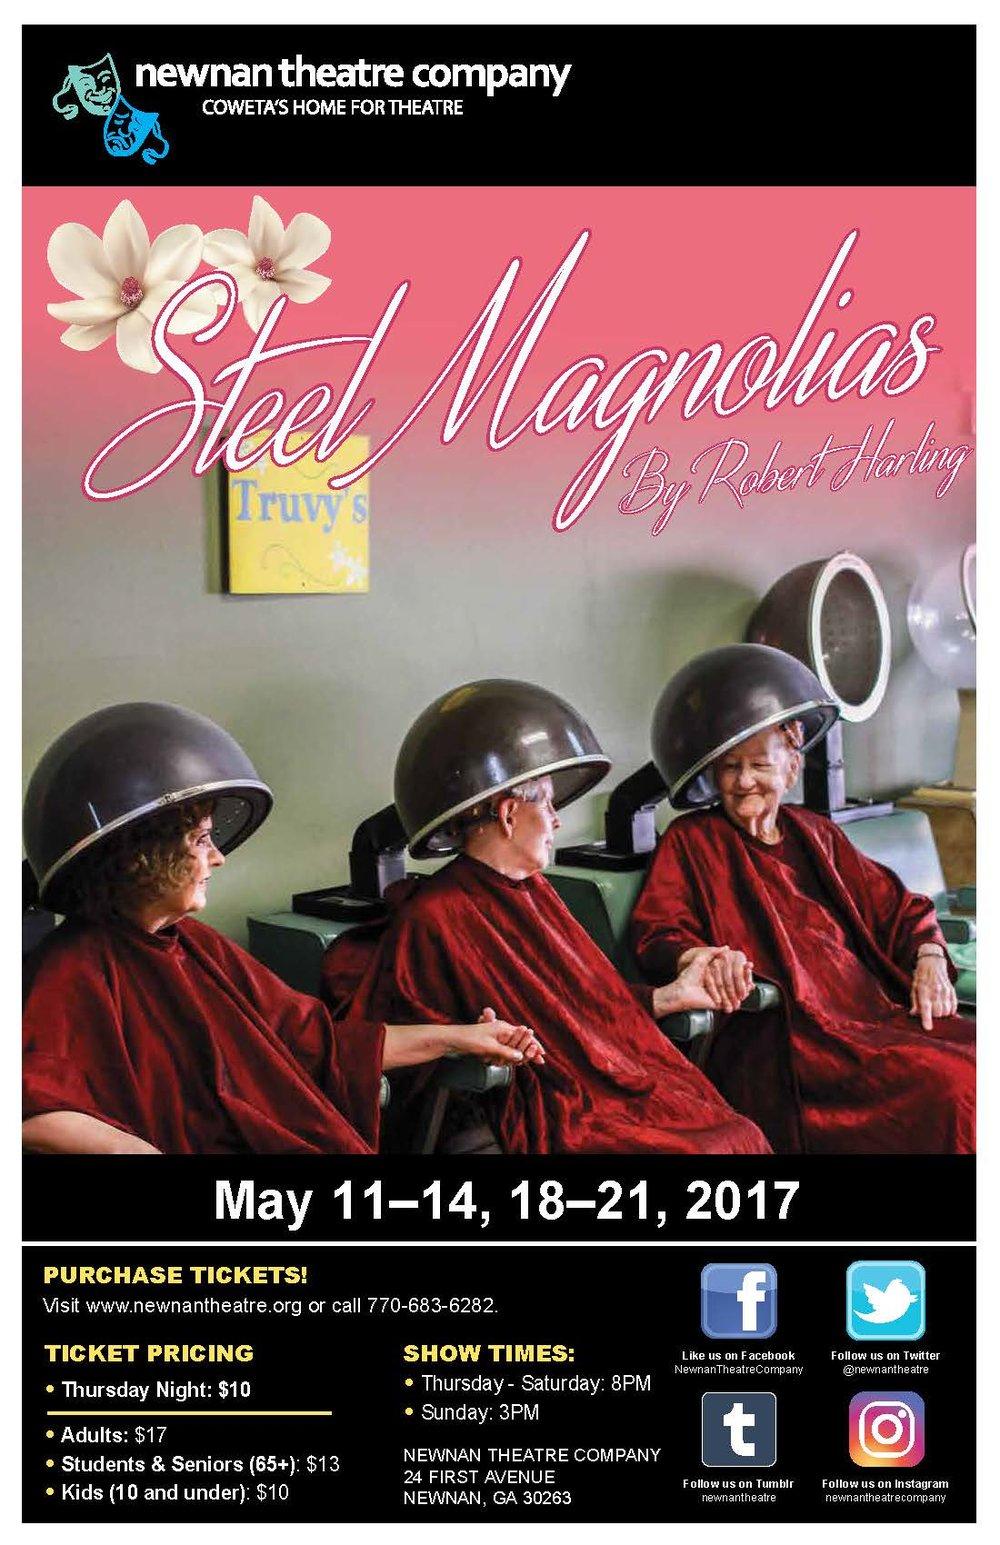 Steel Magnolias poster 11x17.jpg